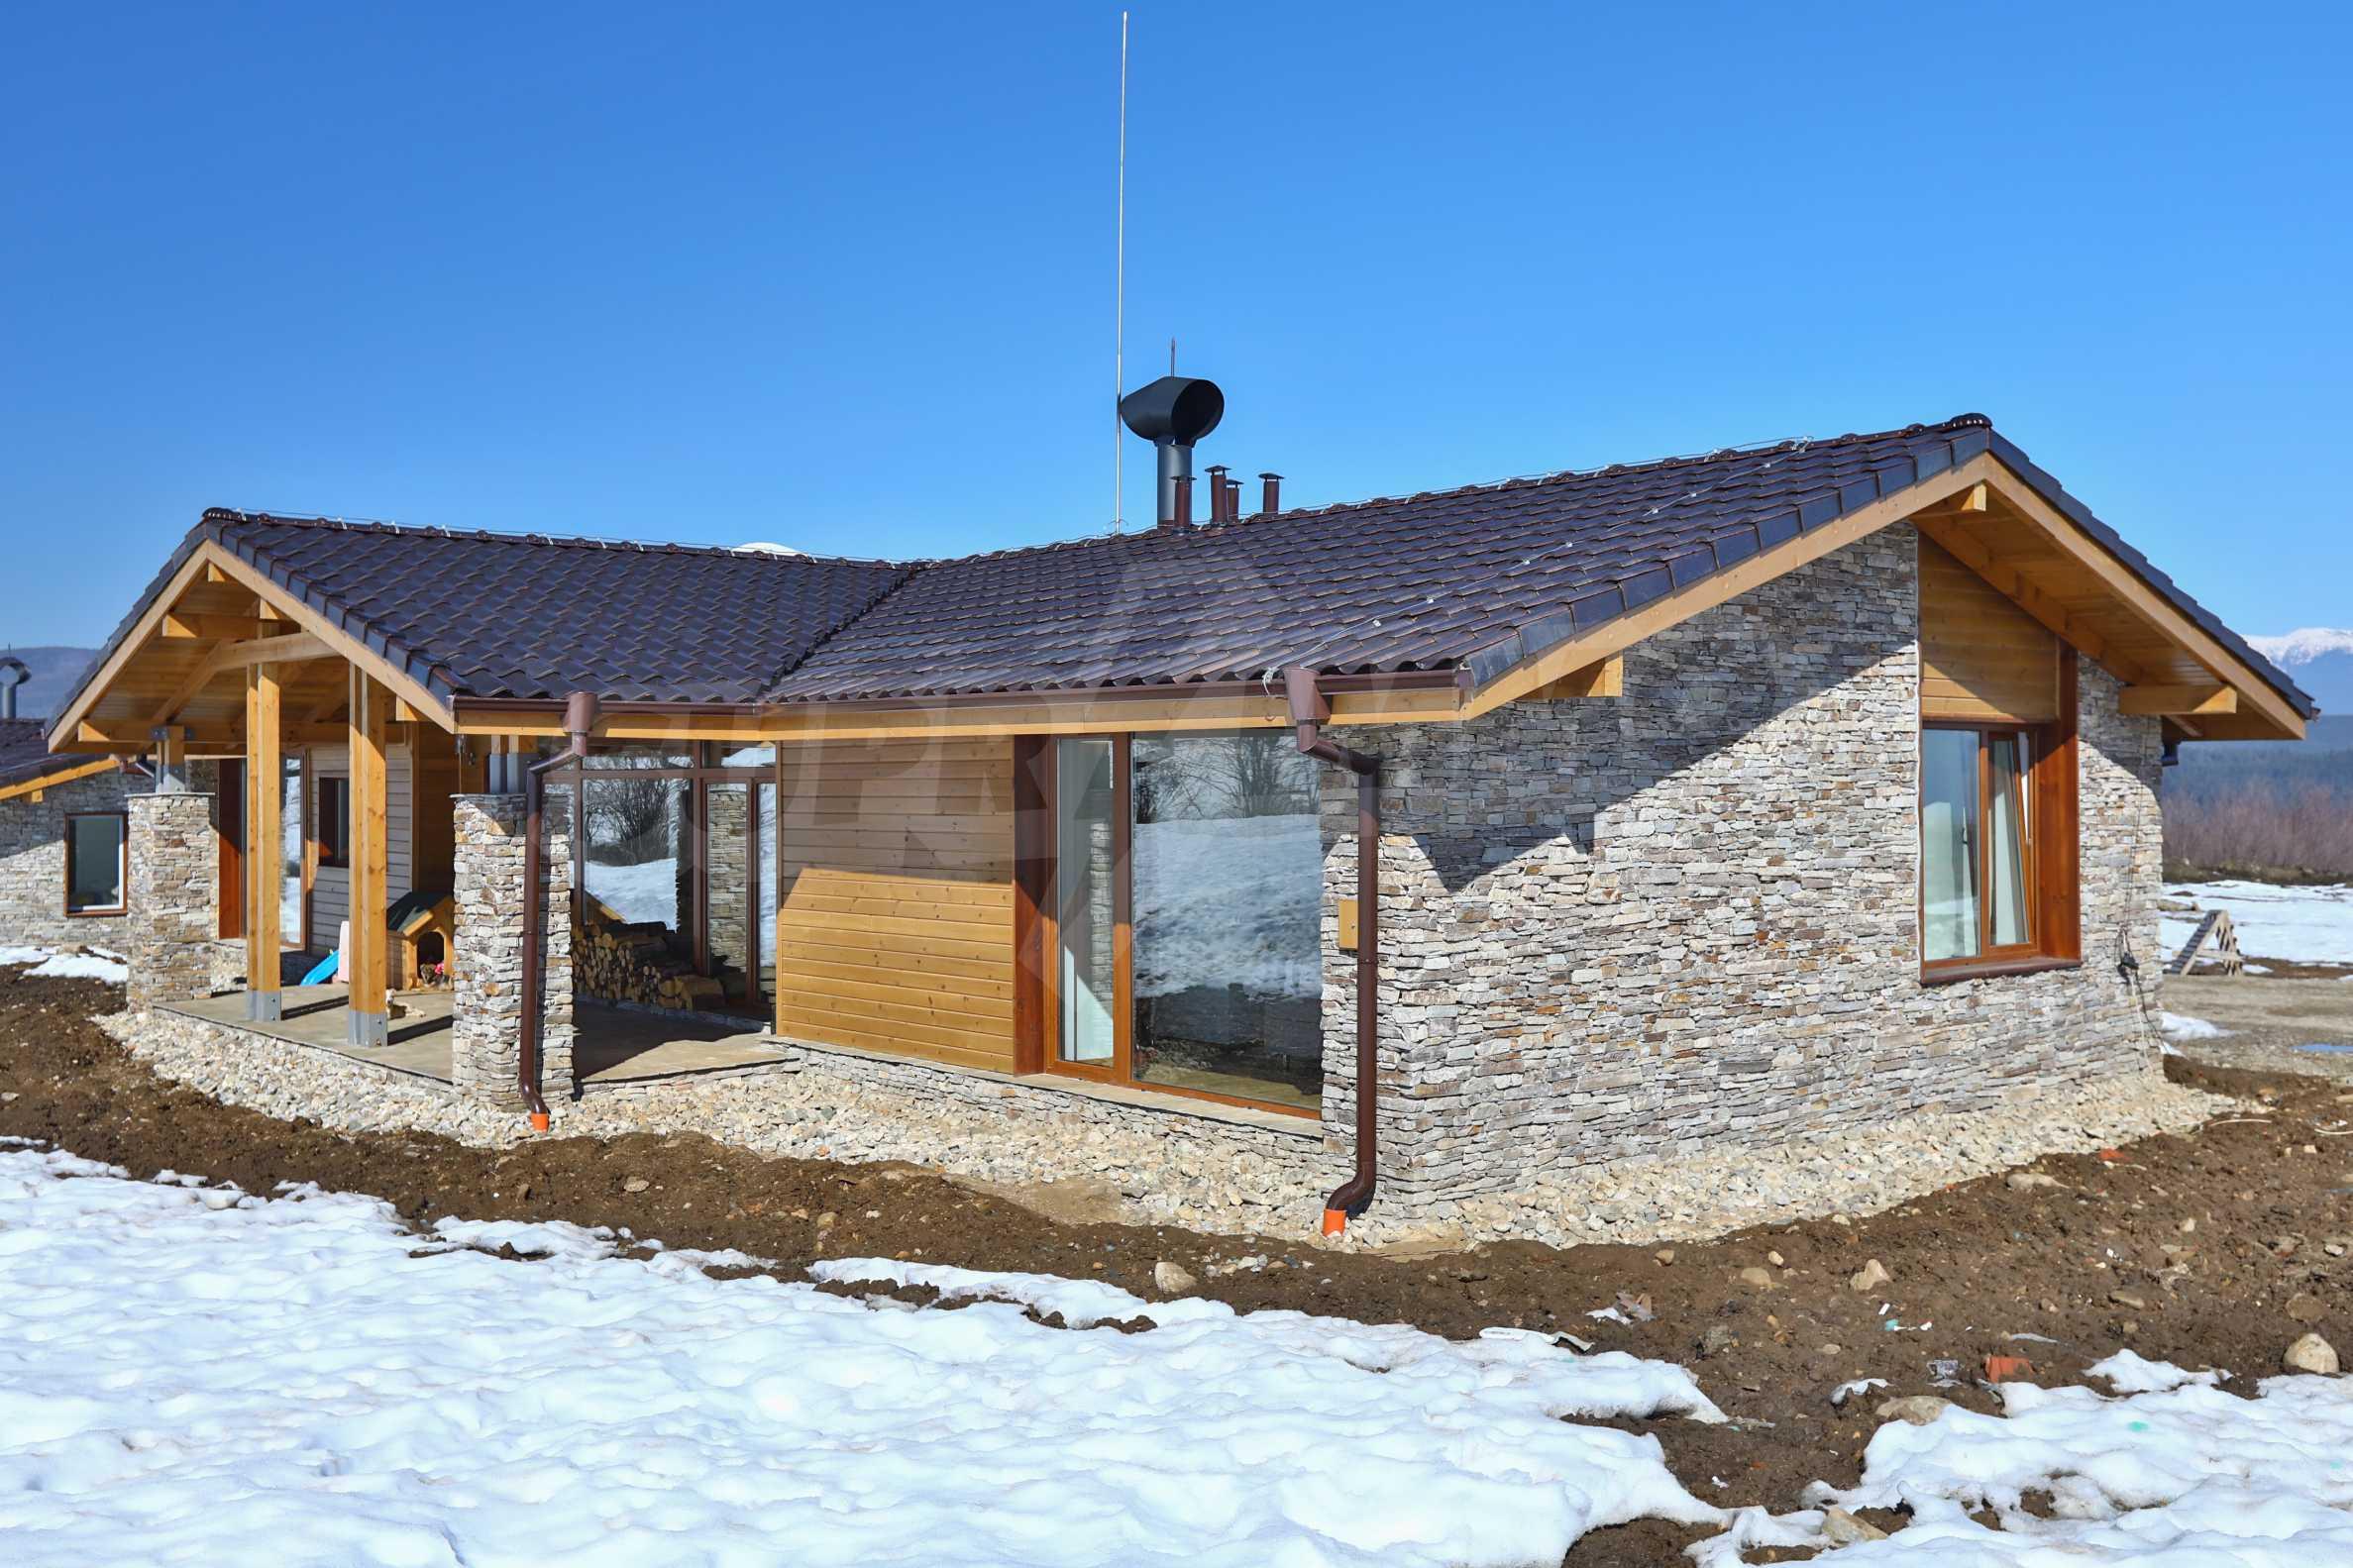 House for sale in Bansko, Bulgaria - Houses for sale - Pirin Hills .